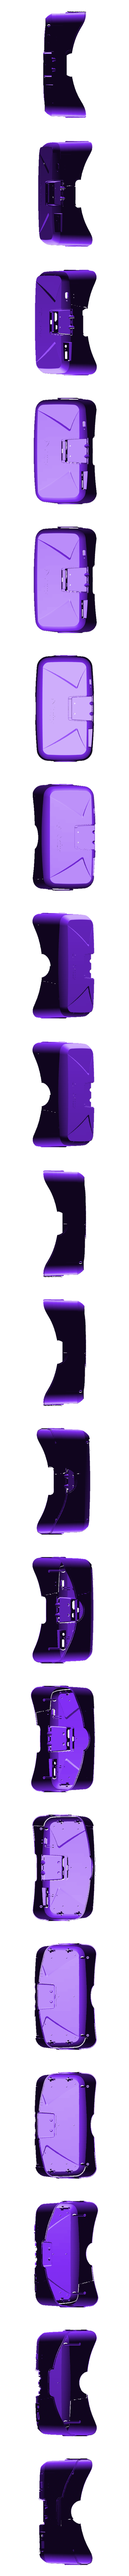 Front_Cover.stl Download free STL file Oculus Rift DK2 • 3D printing object, indigo4